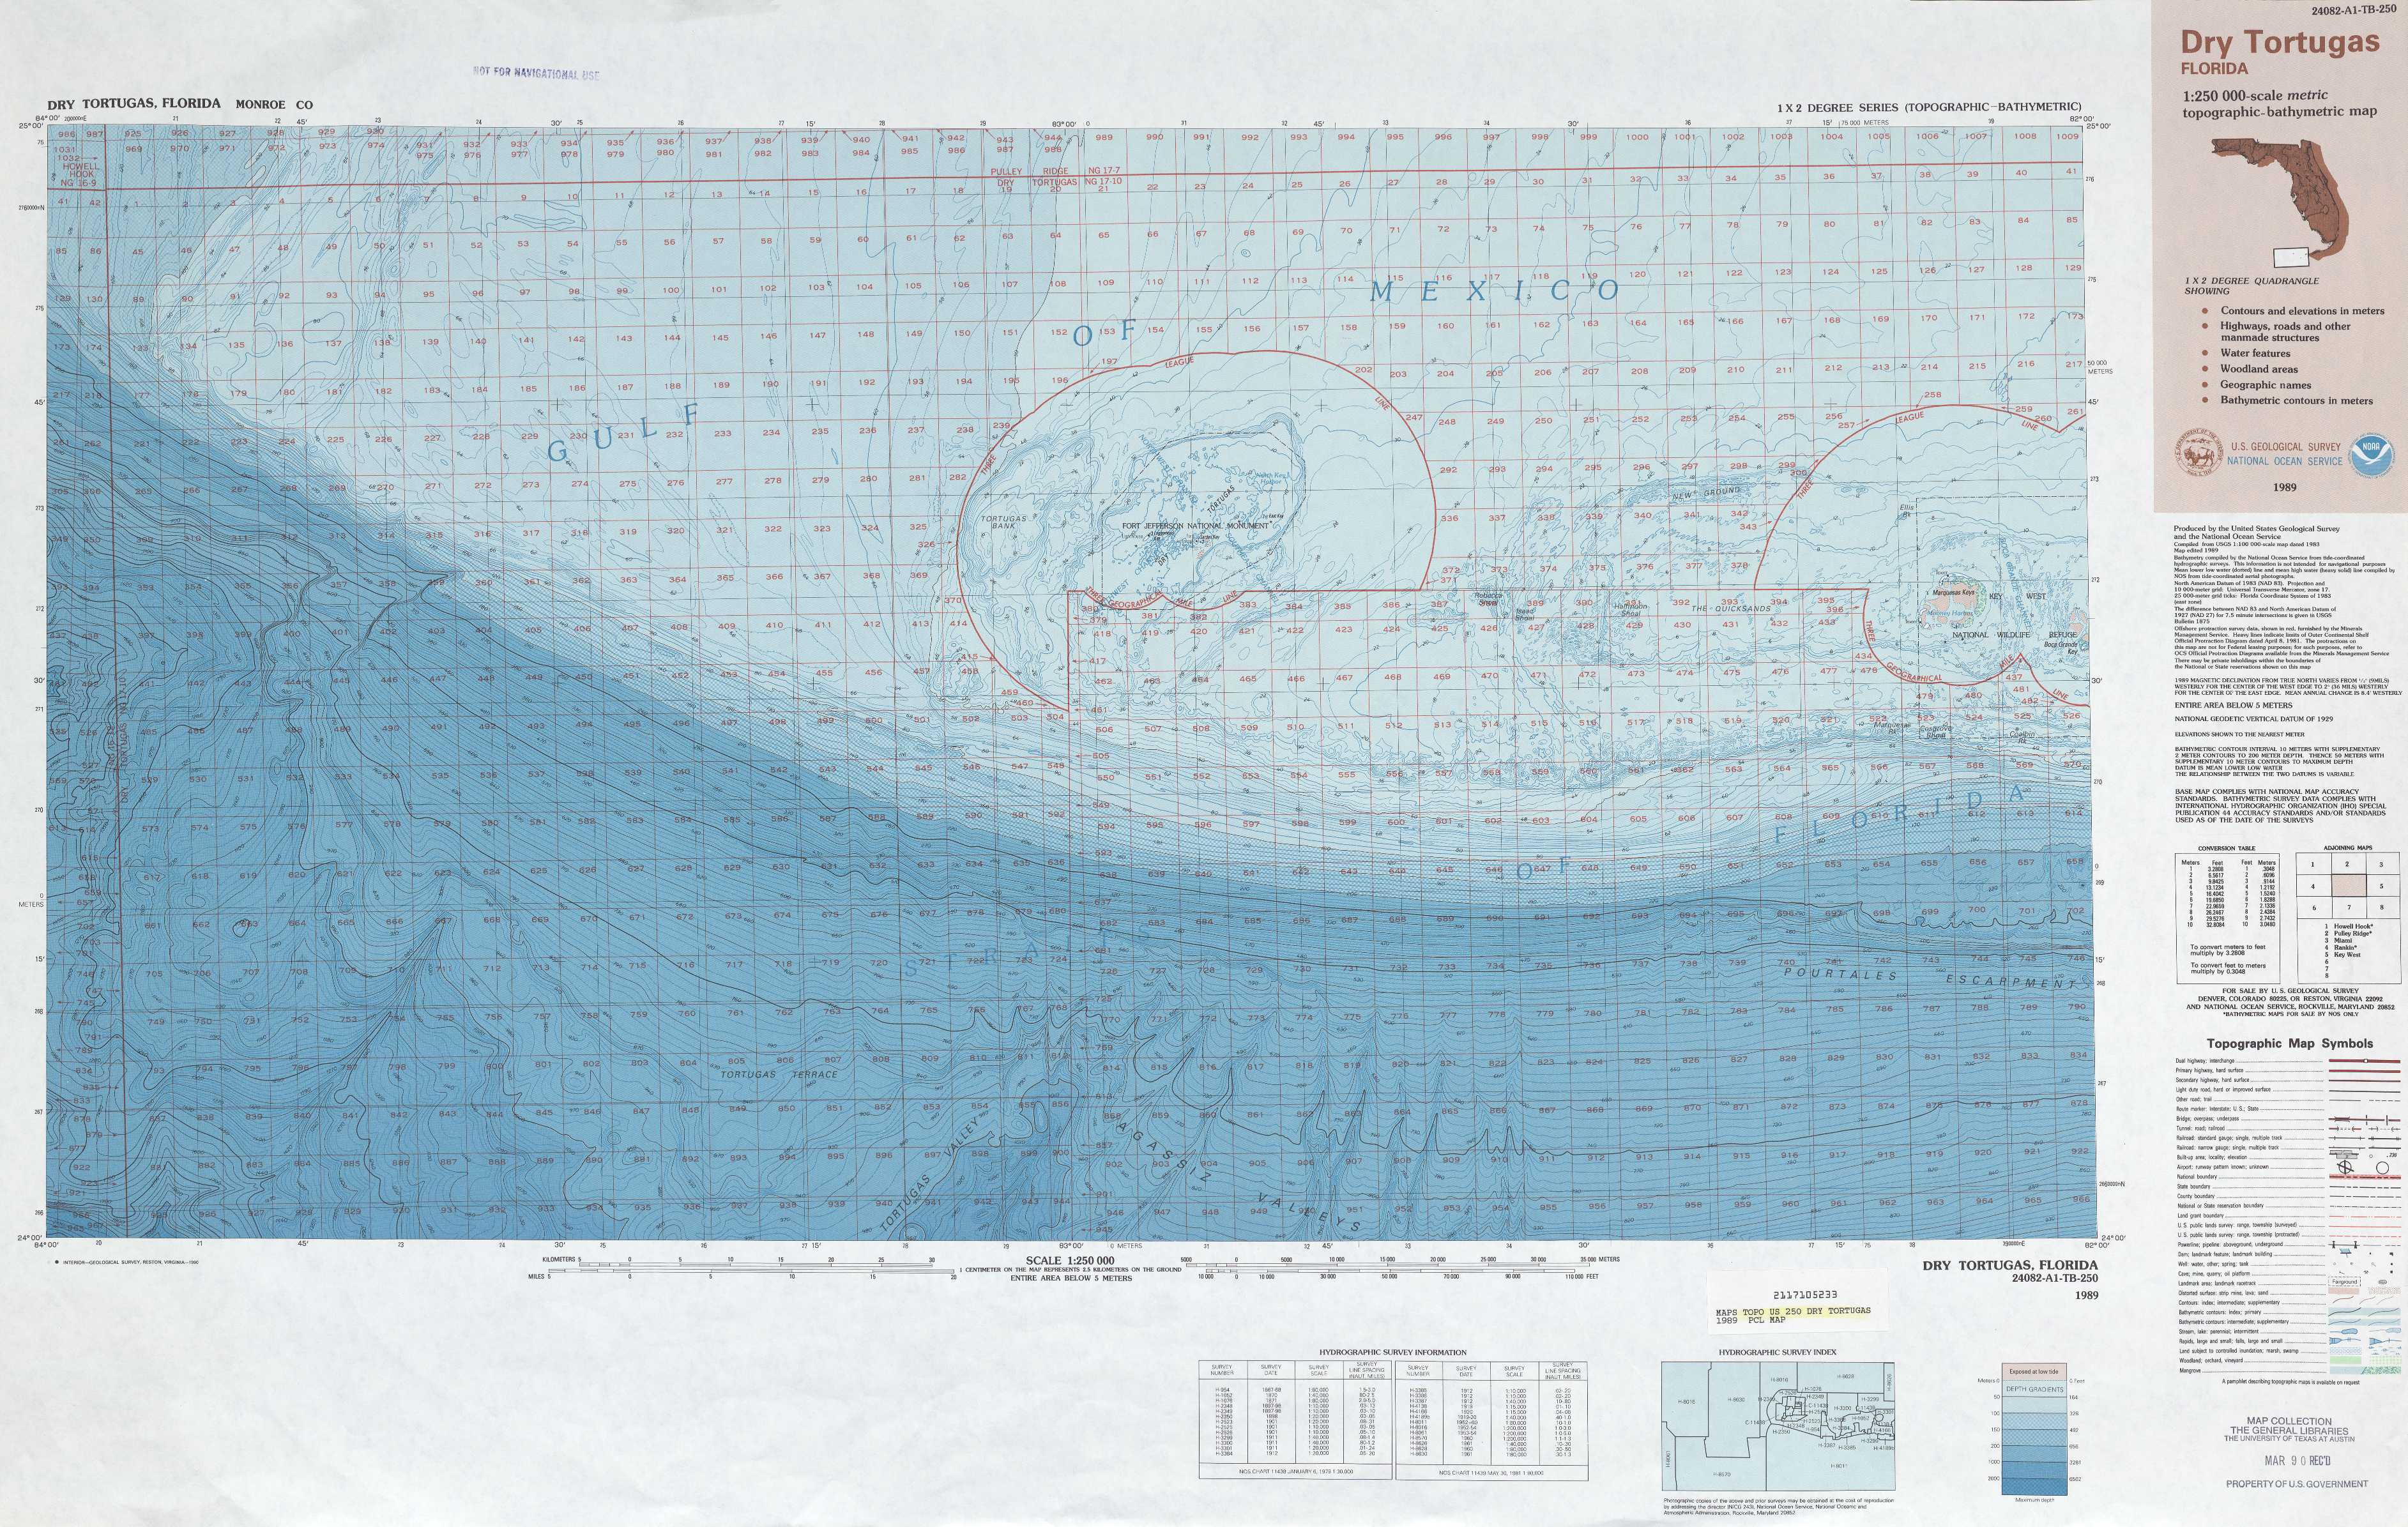 Dry Tortugas topographic maps FL USGS Topo Quad 24082a1 at 1